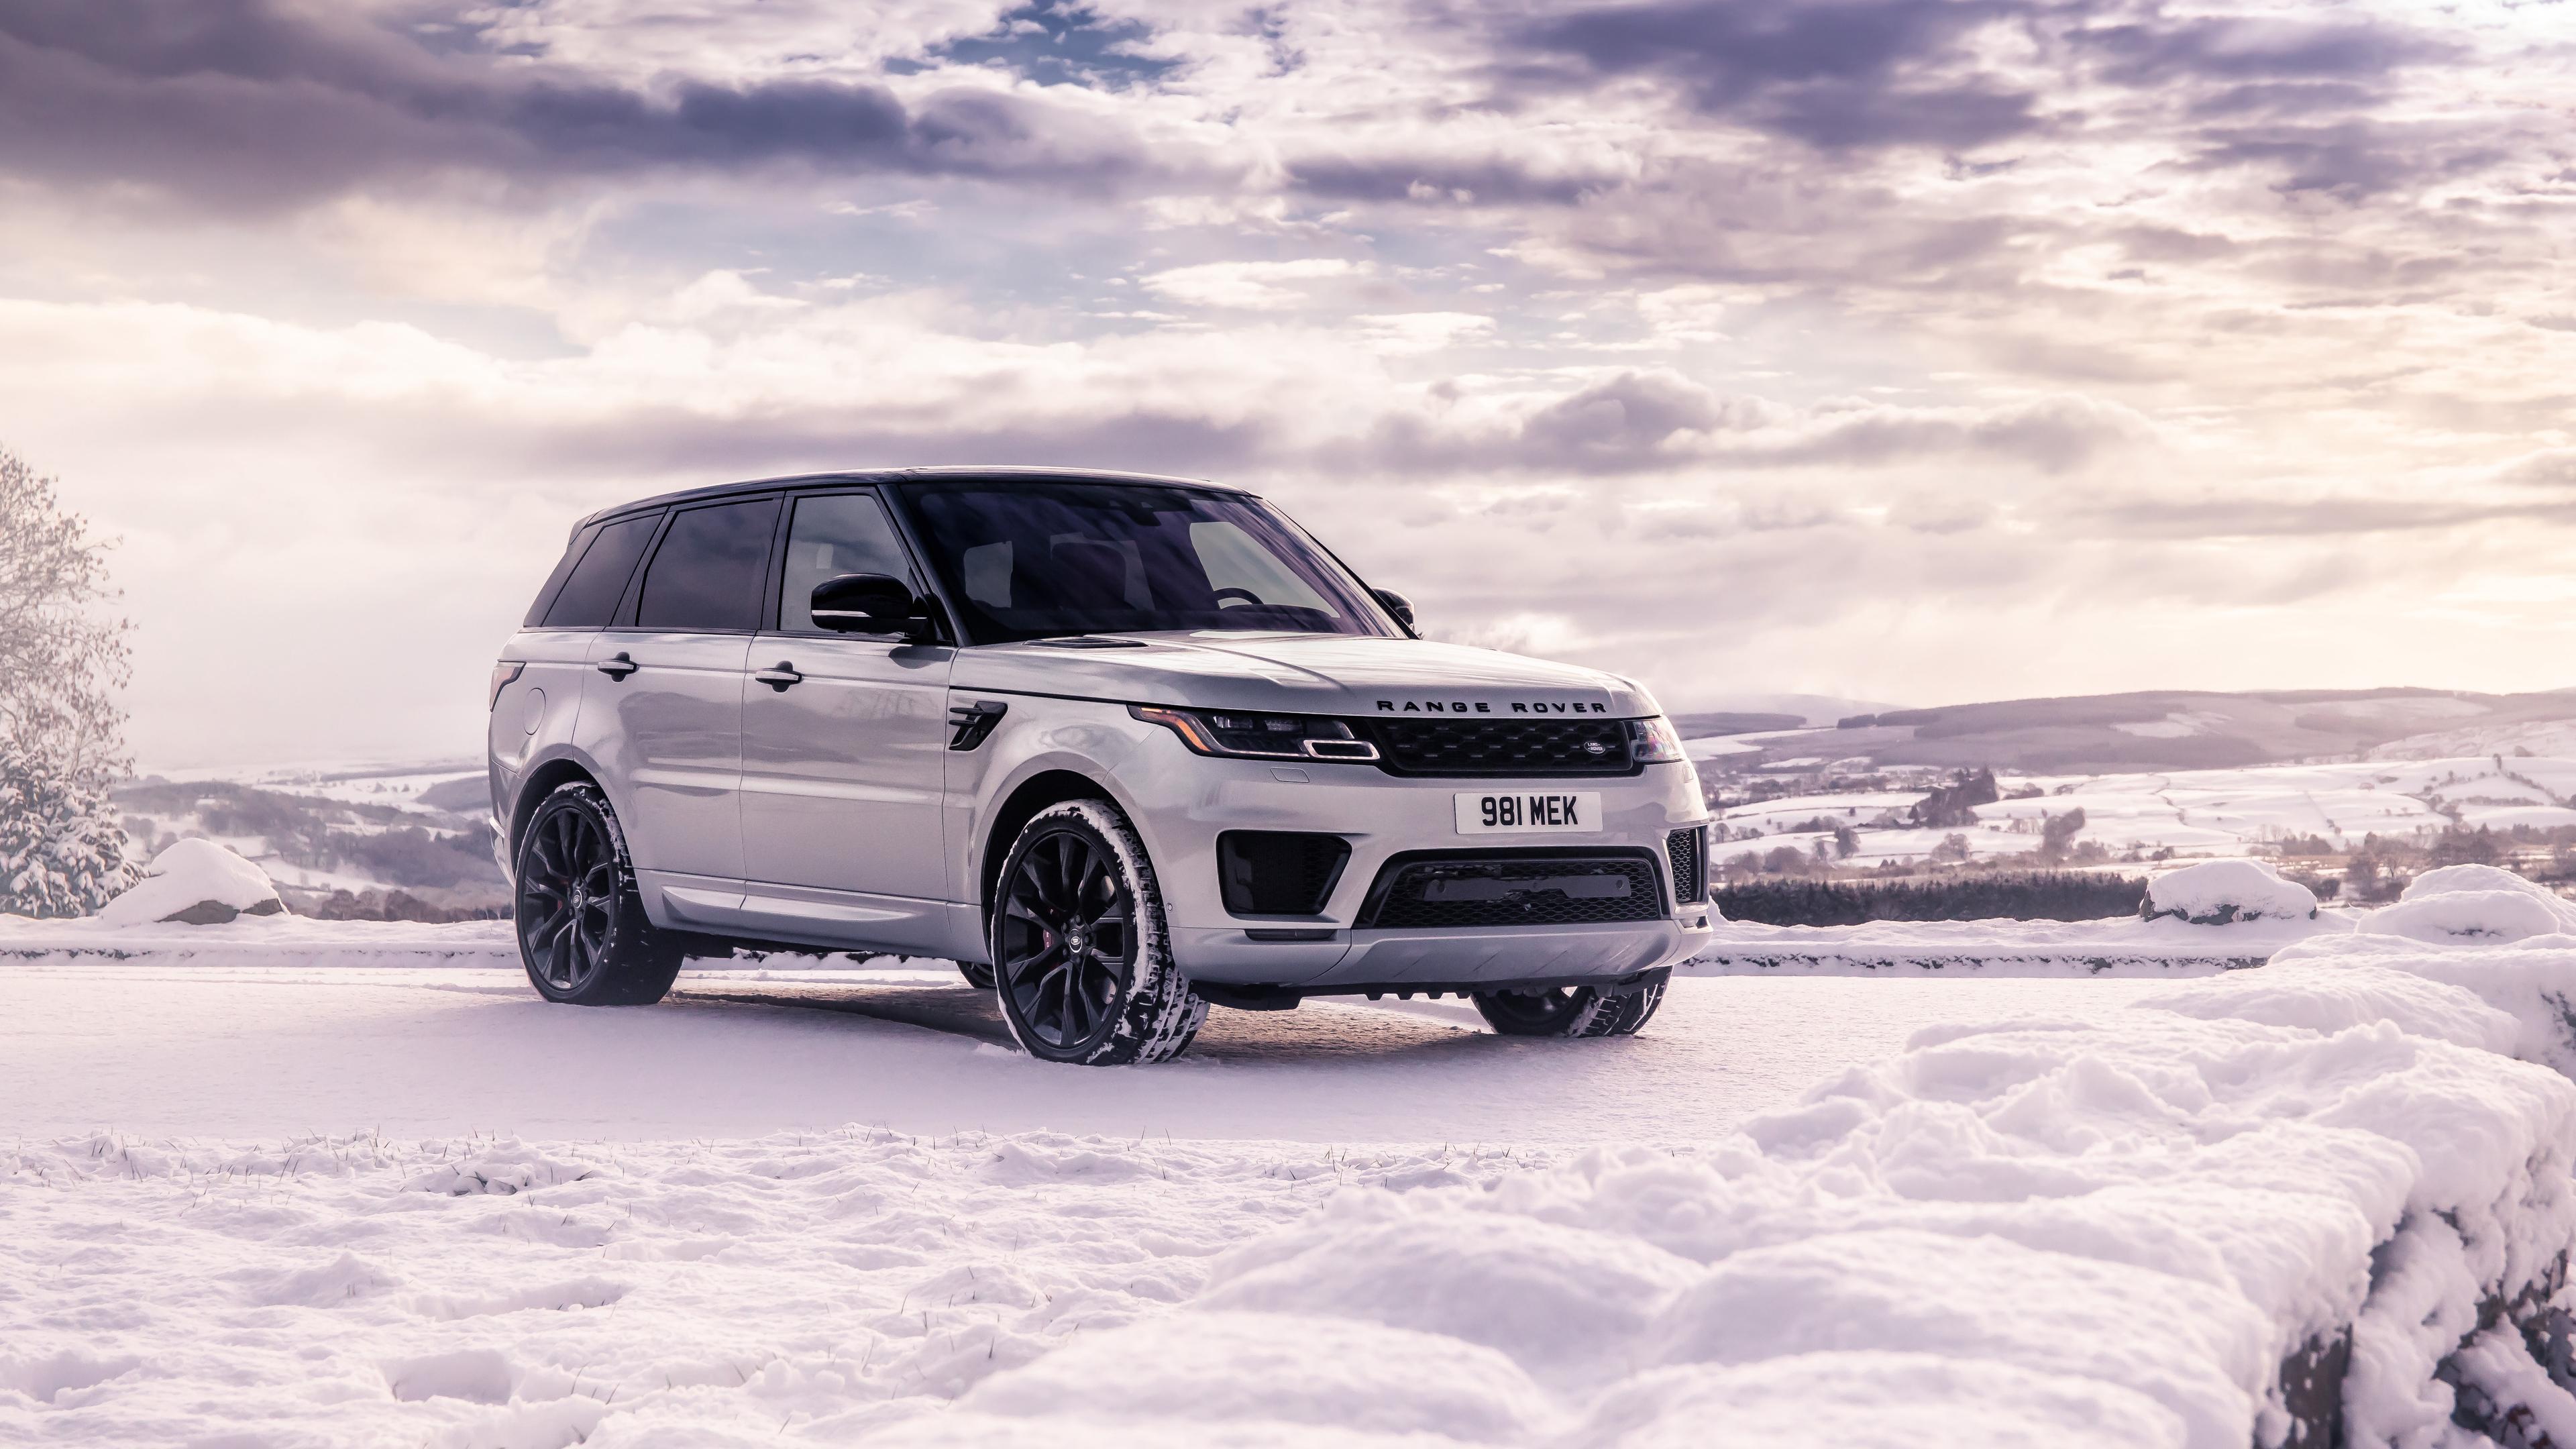 range rover sport hst 4k 1553075569 - Range Rover Sport HST 4k - range rover wallpapers, land rover wallpapers, hd-wallpapers, cars wallpapers, 5k wallpapers, 4k-wallpapers